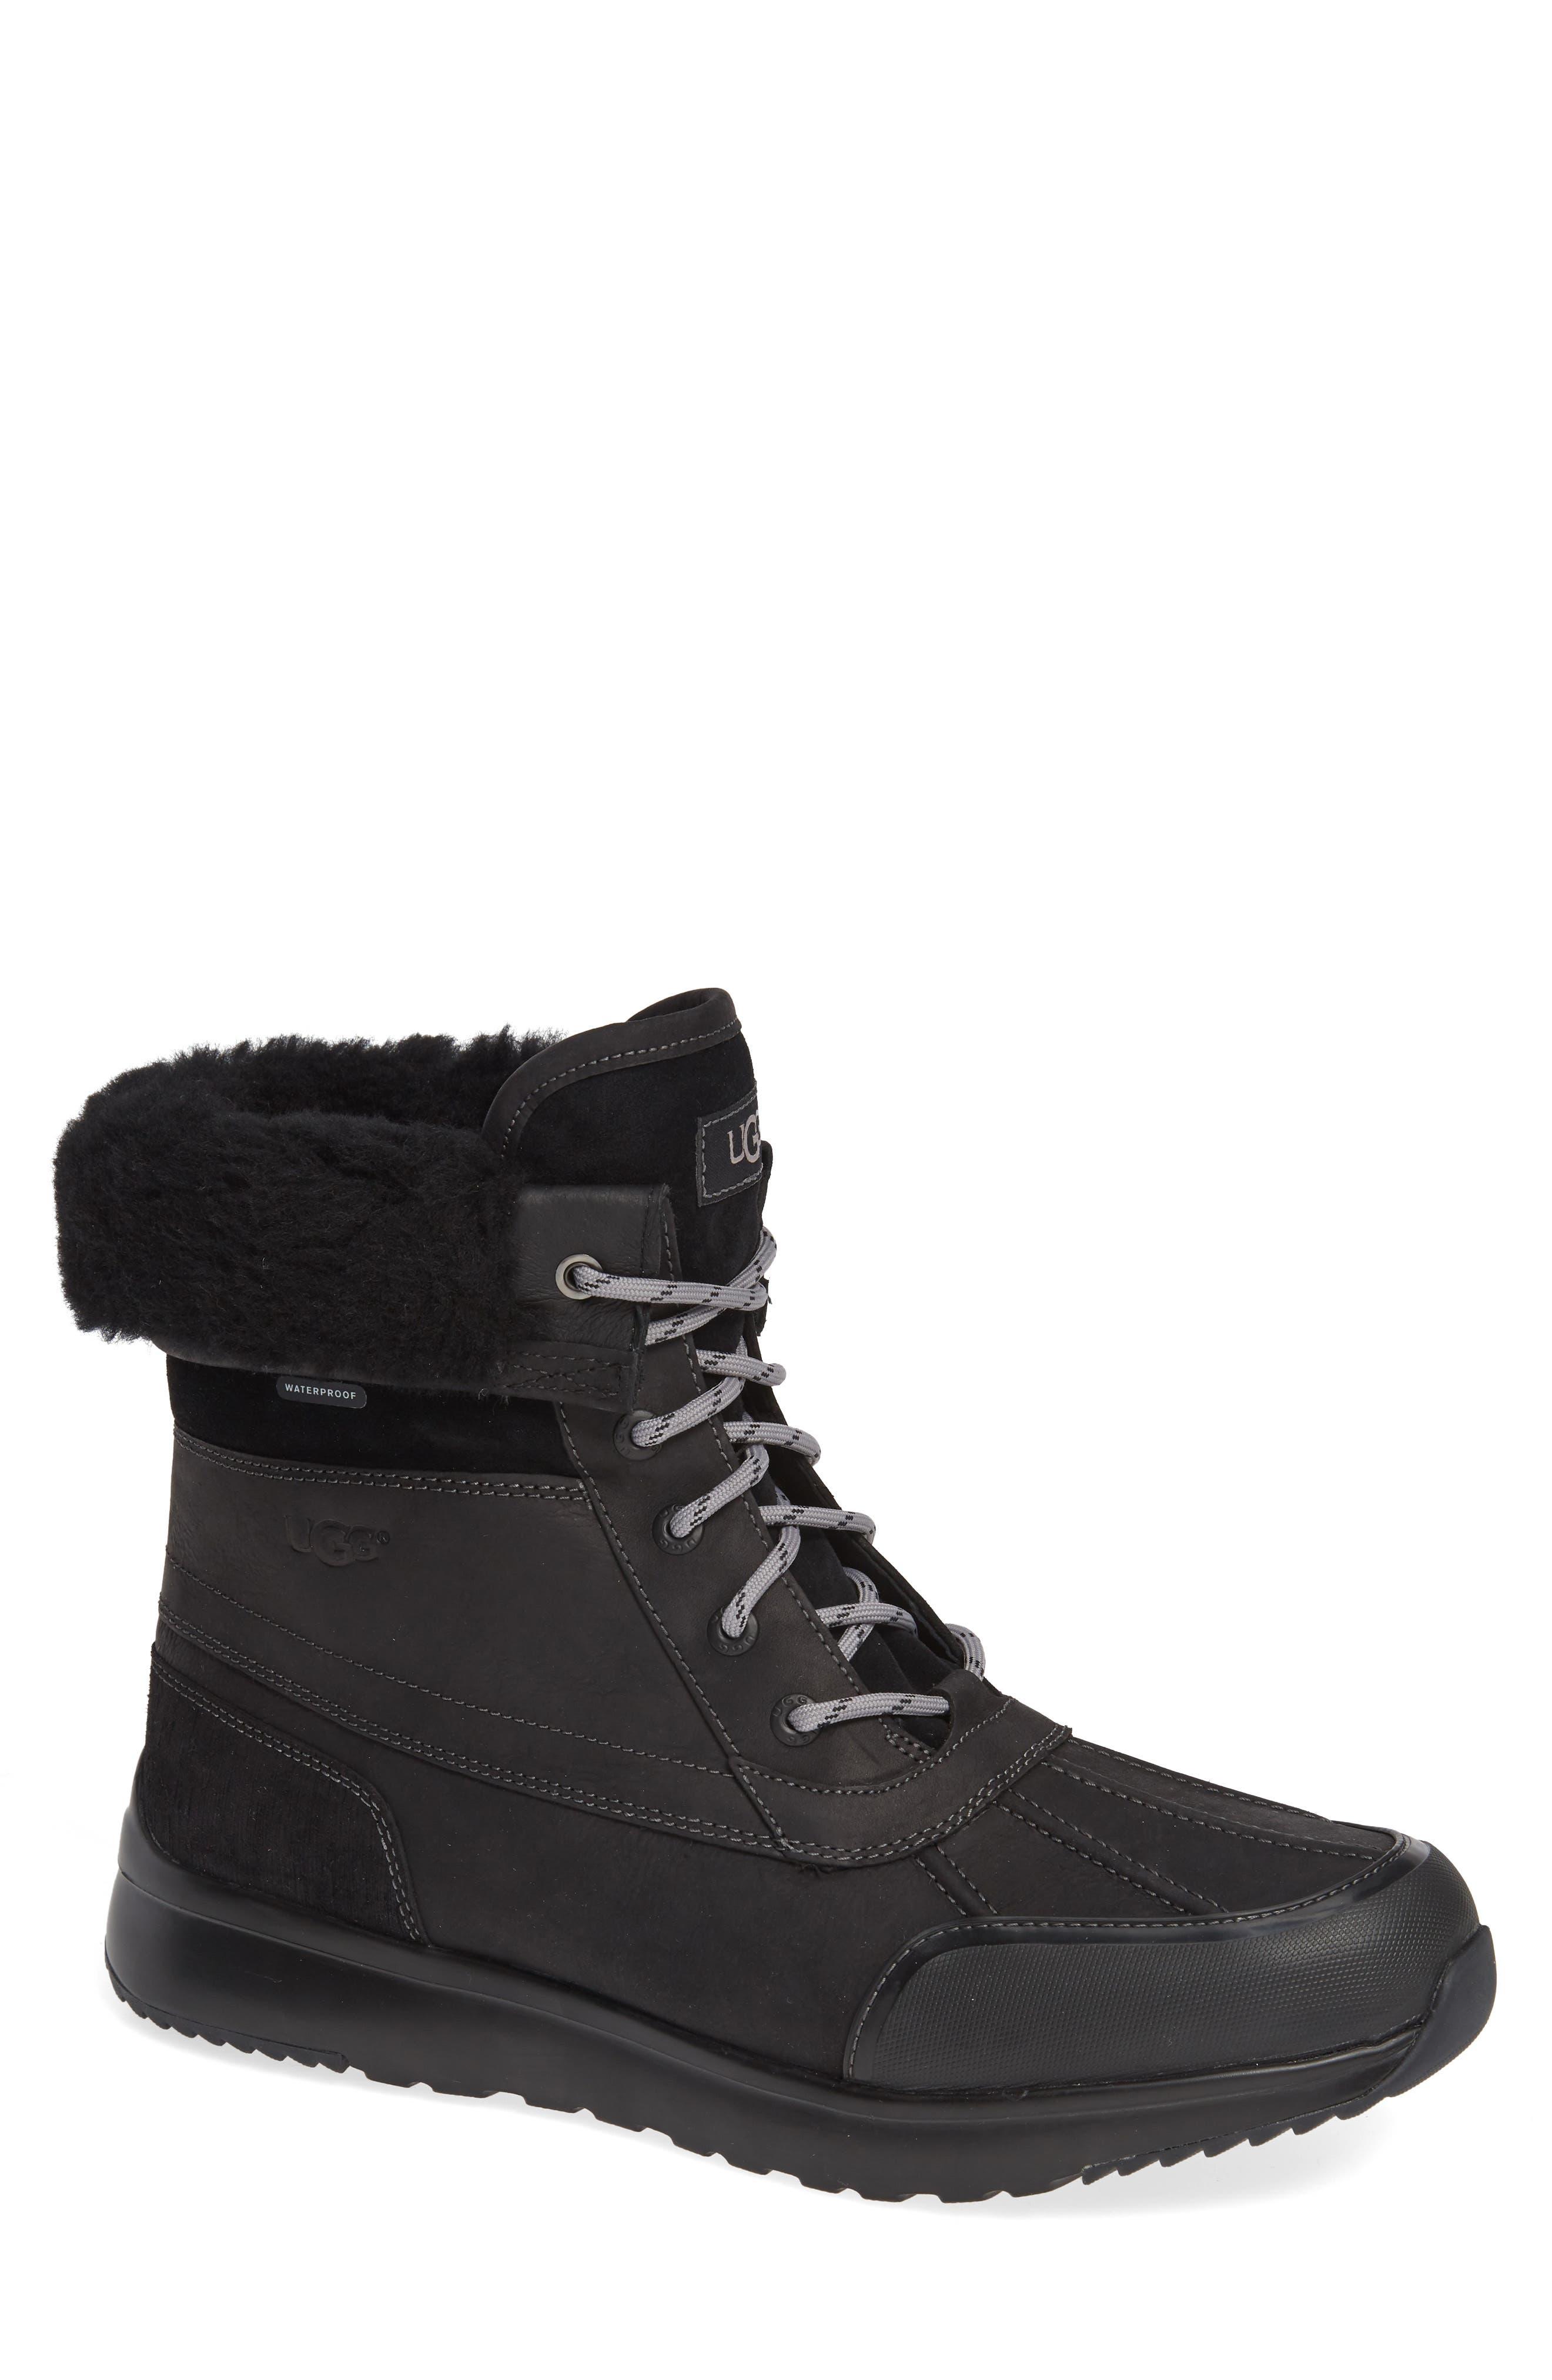 Ugg Eliasson Waterproof Snow Boot, Black